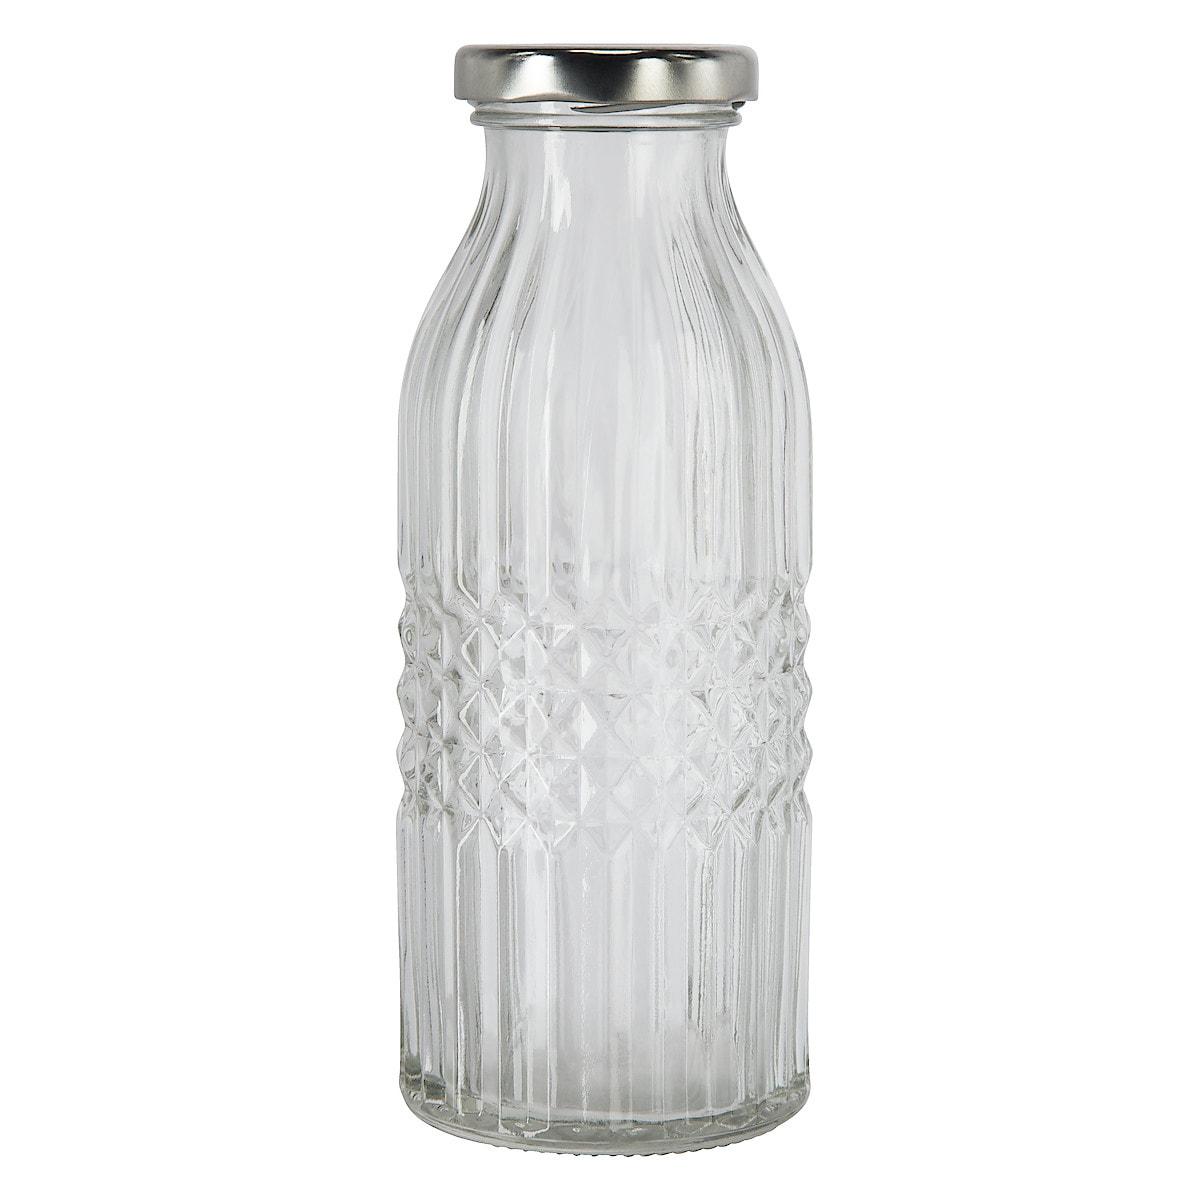 Glasflaska med skruvkork 4-pack